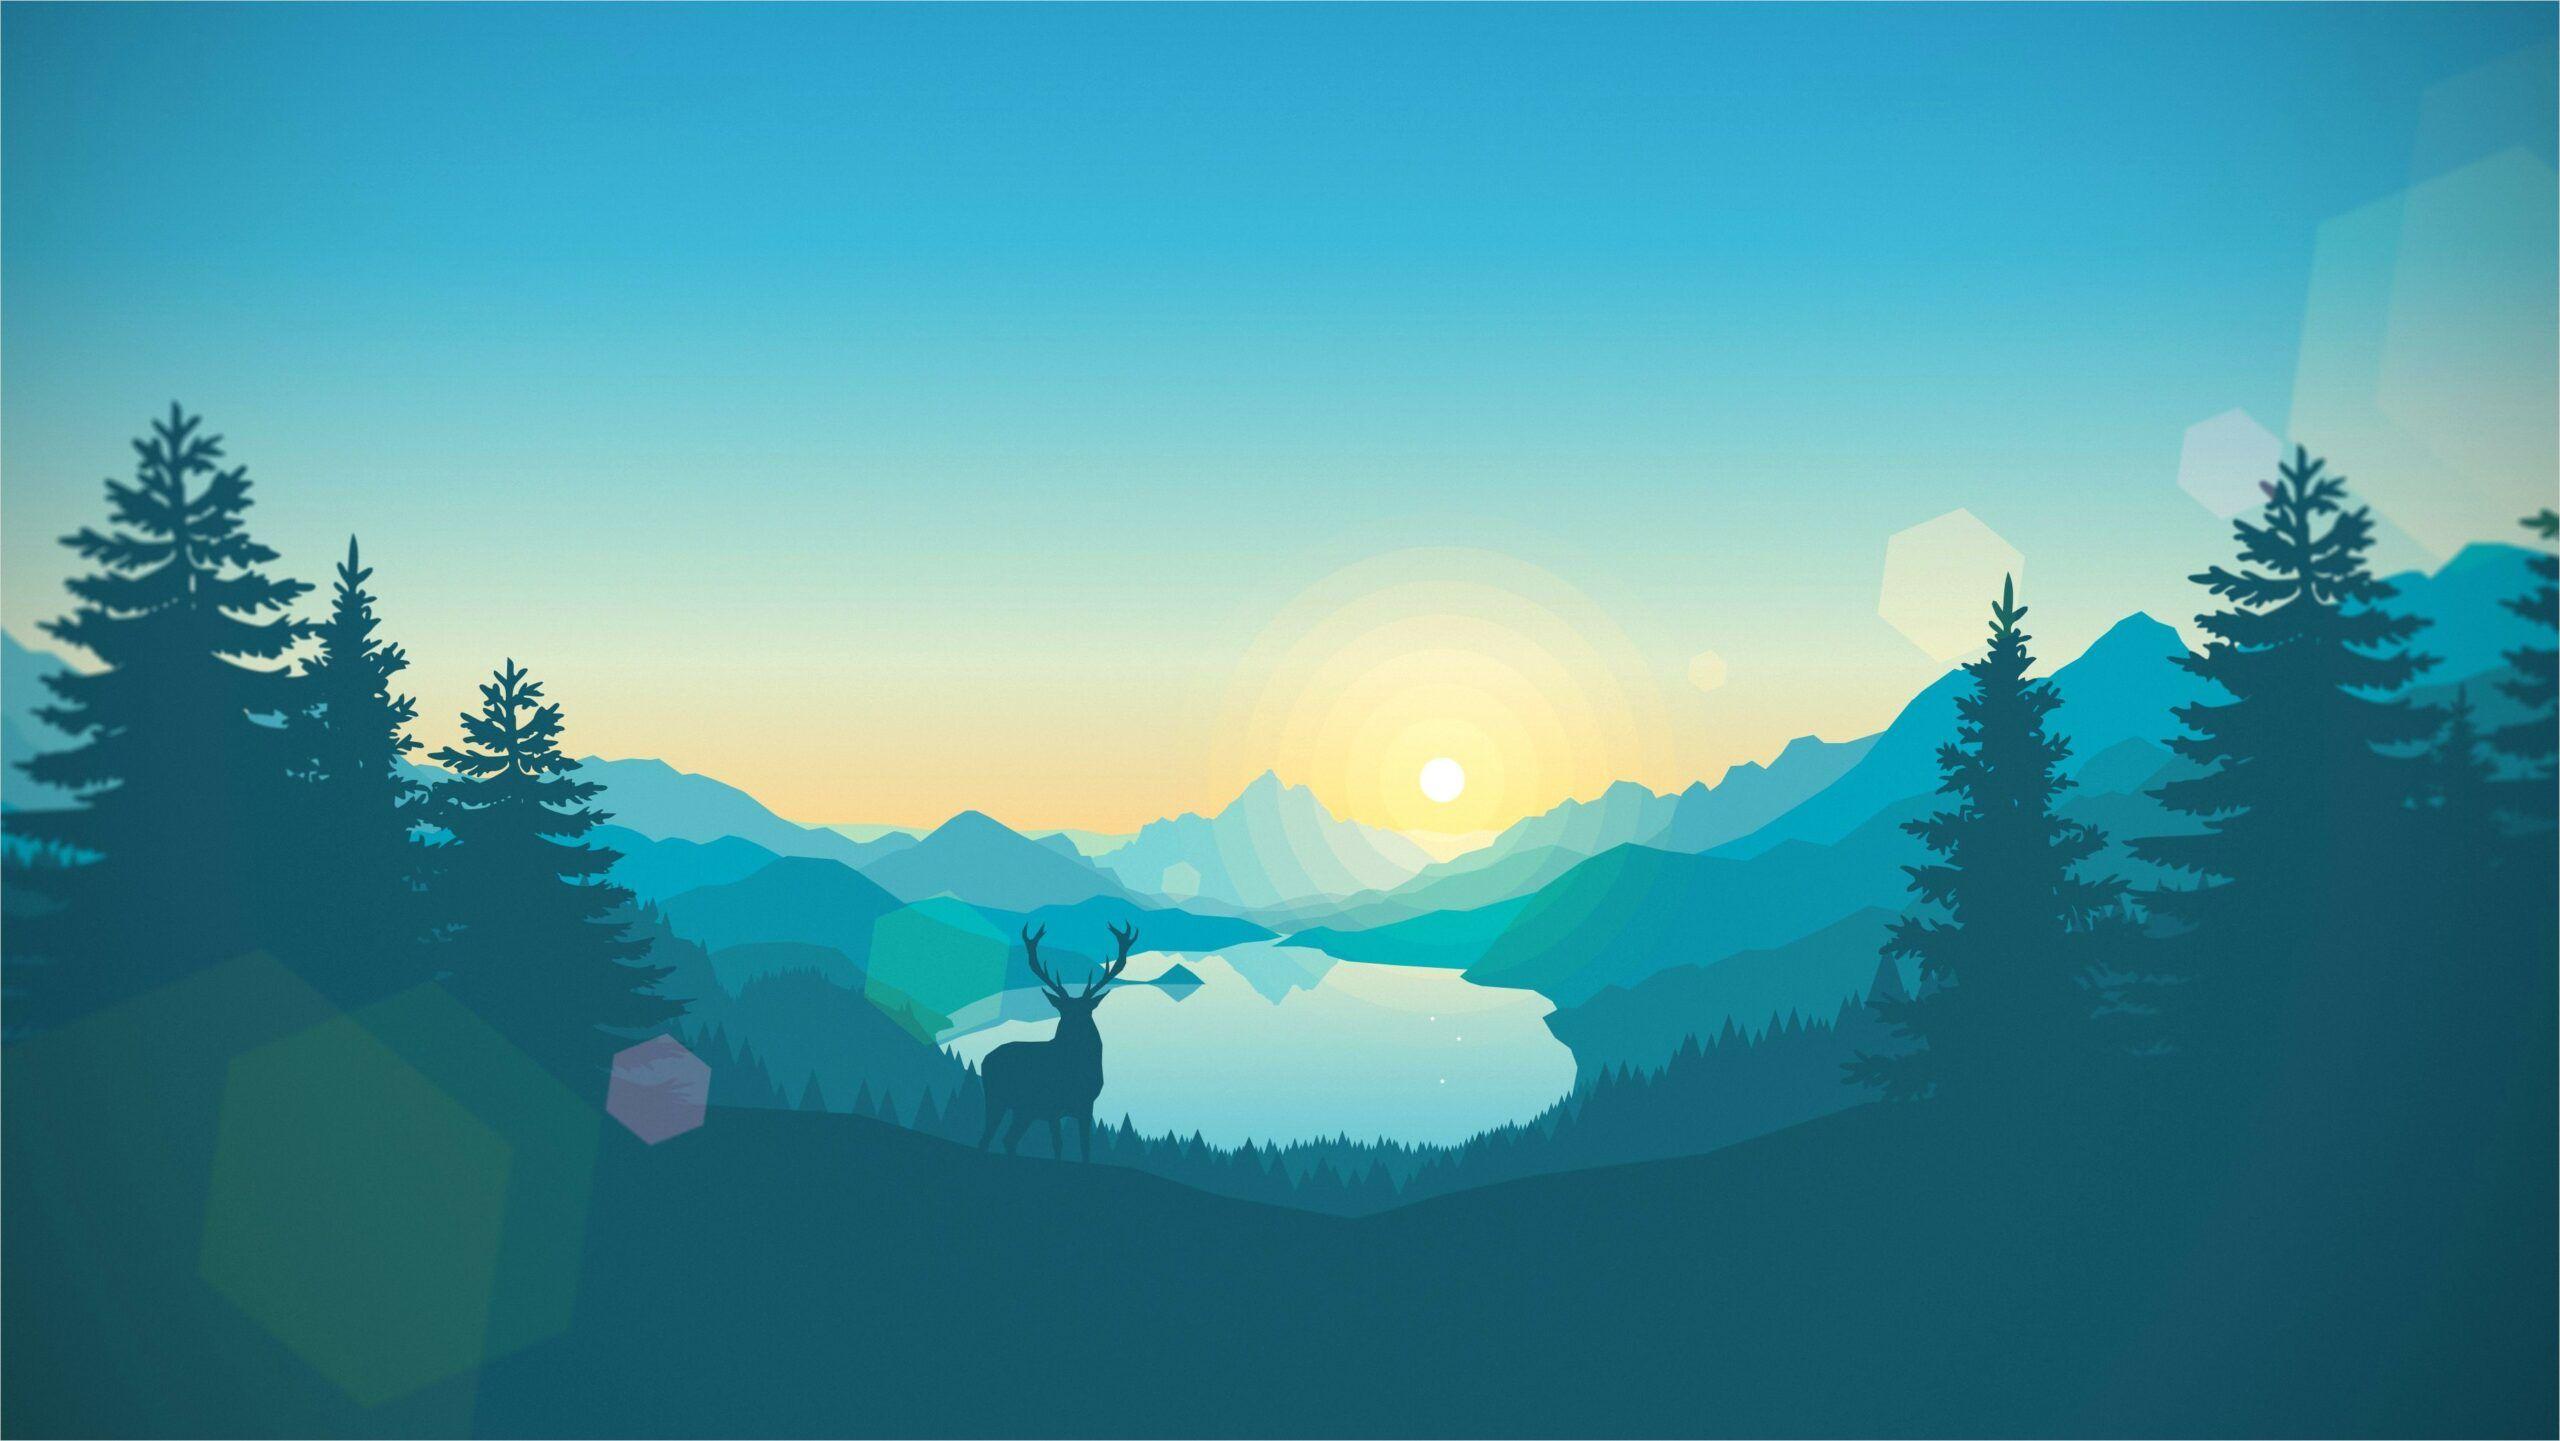 3840 215 2160 Wallpaper 4k Reddit In 2020 Landscape Wallpaper Wallpaper Pictures Nature Wallpaper